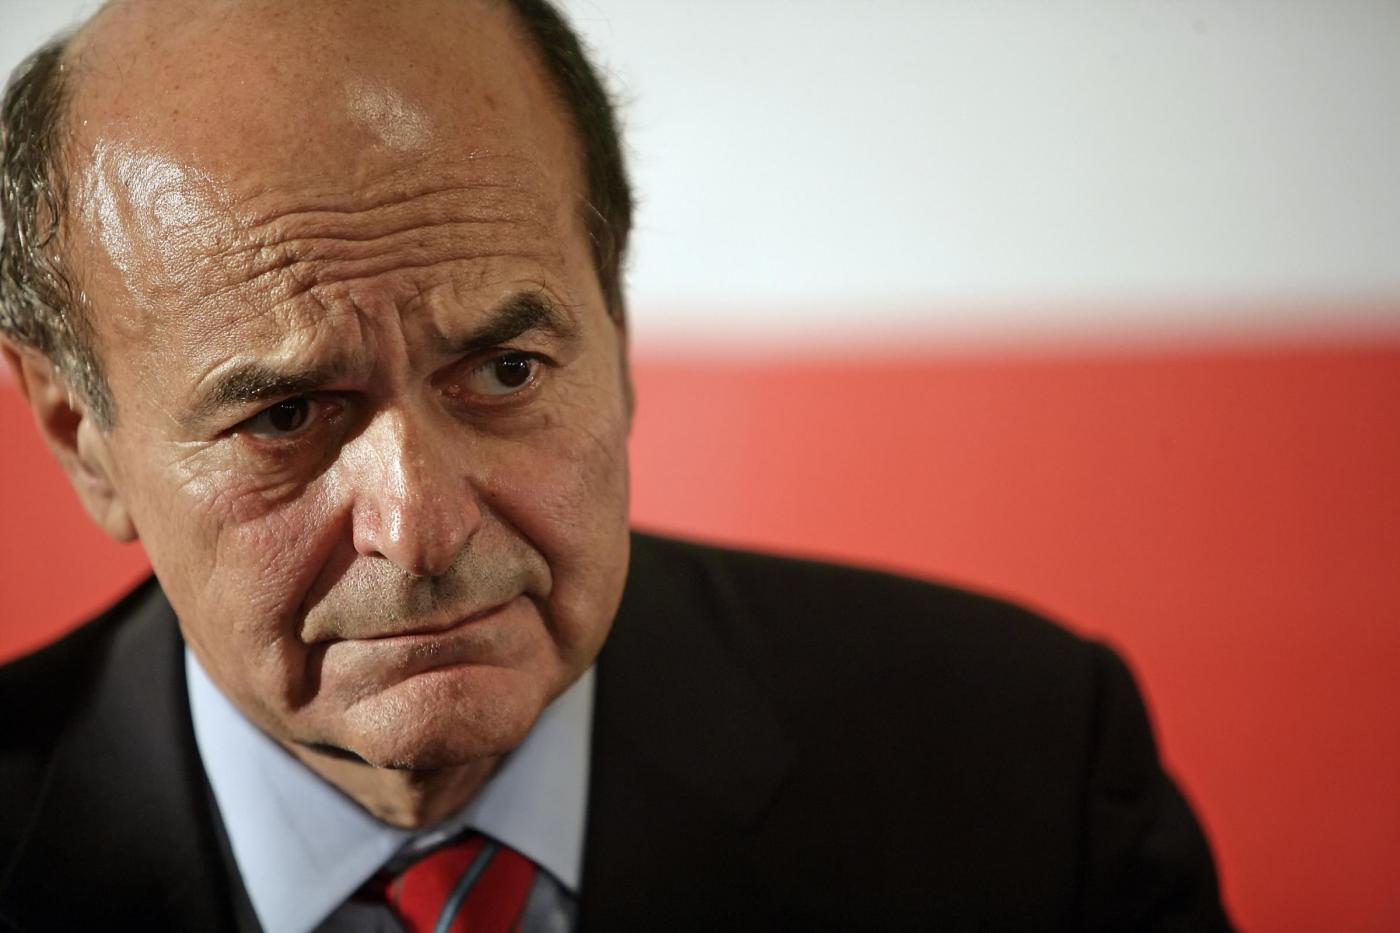 Tensione nei dem sull'italicum, Bersani attacca